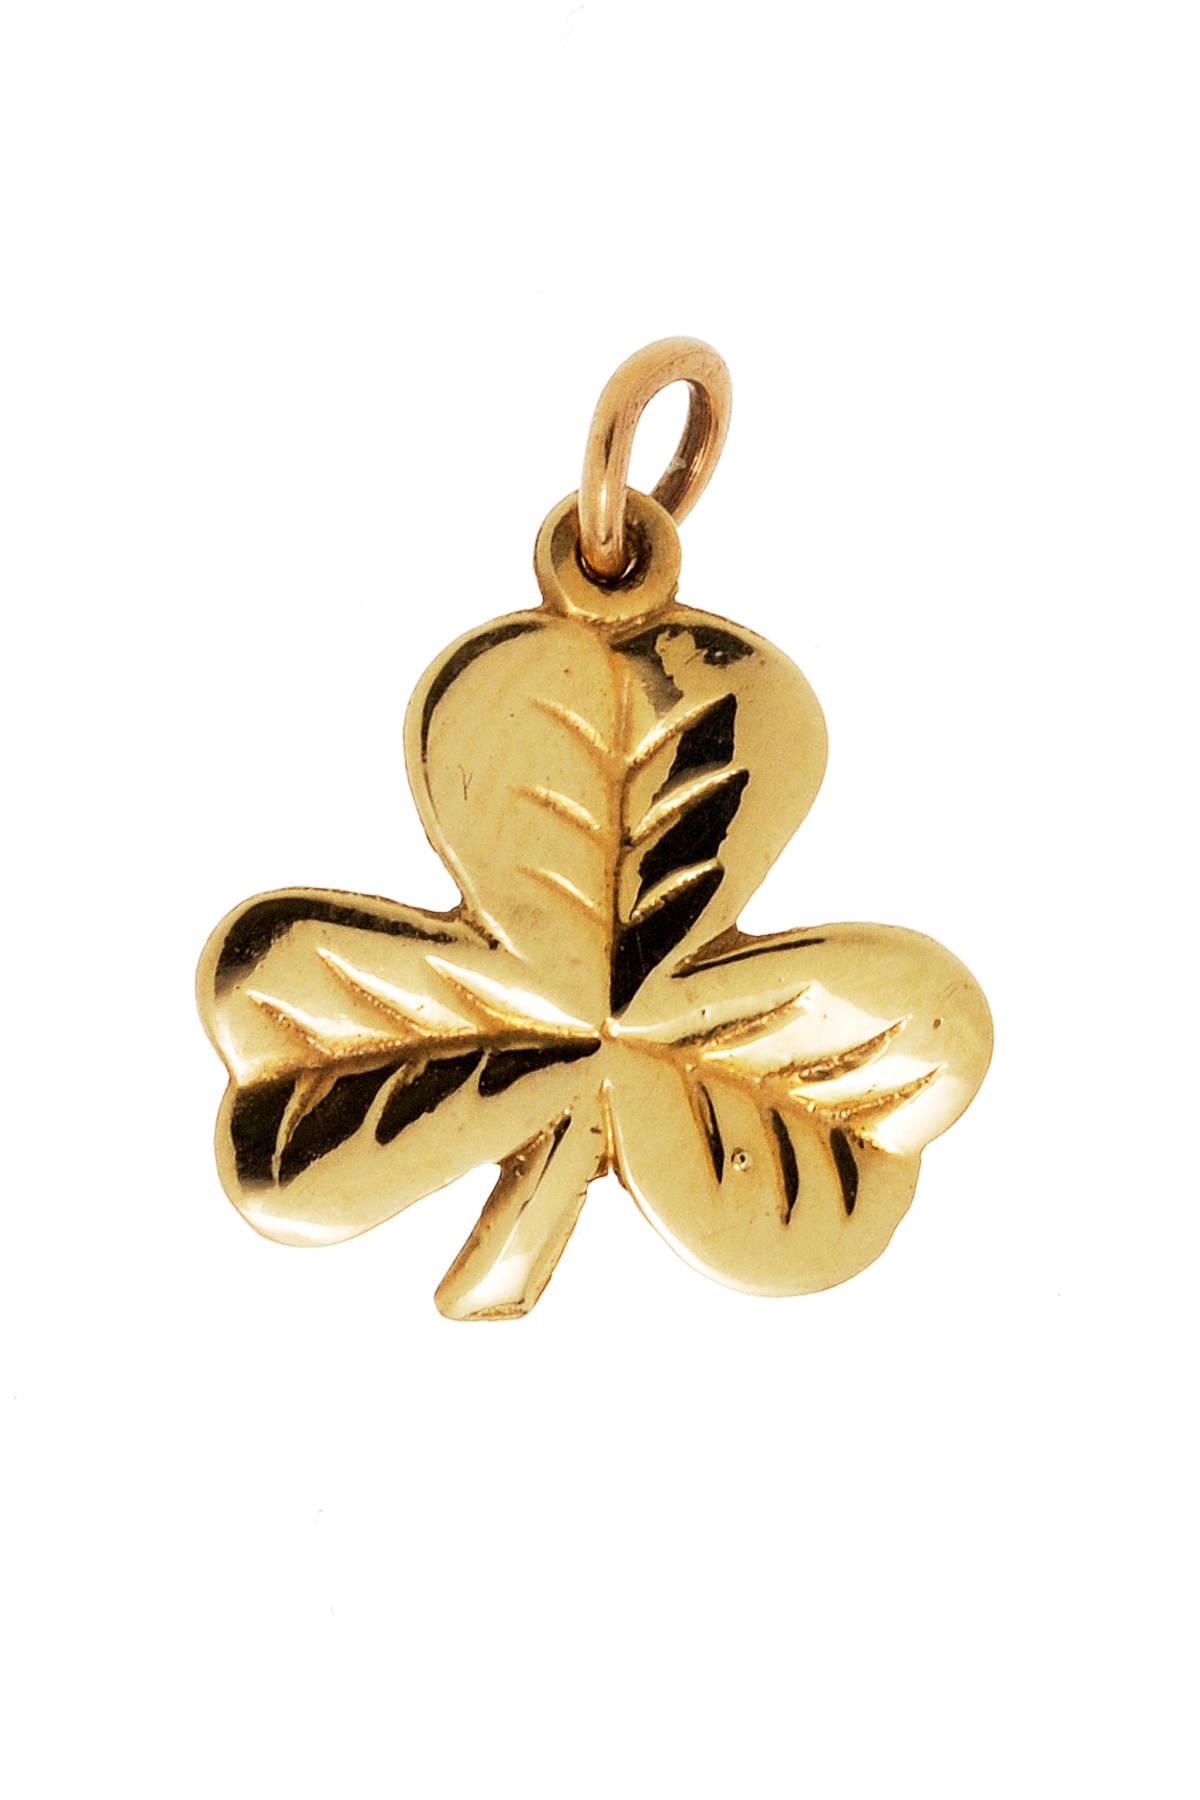 10 carat yellow gold shamrock charm(no chain) 13mmX14mm